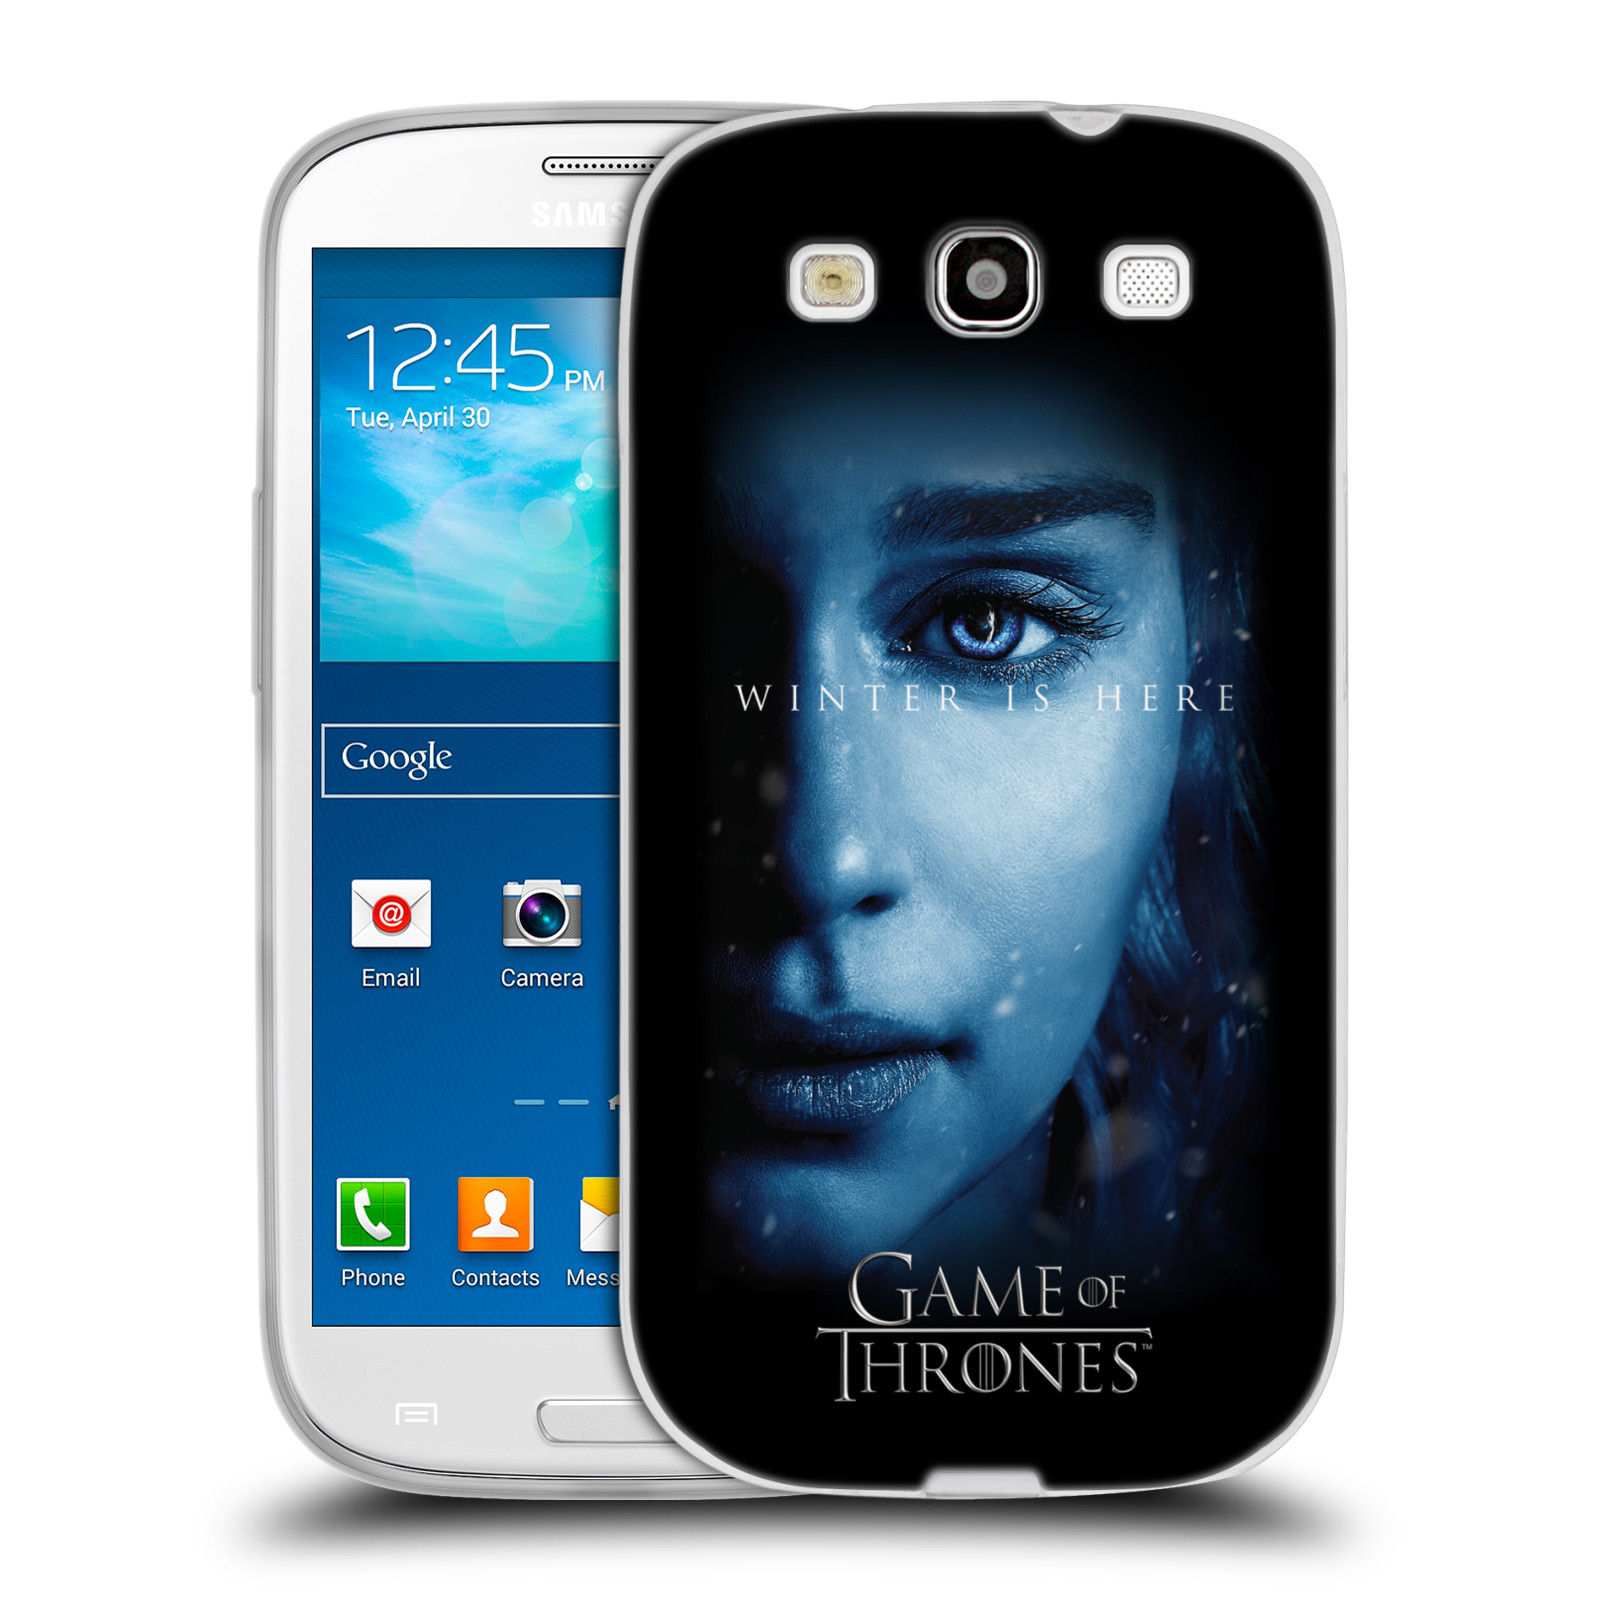 Silikonové pouzdro na mobil Samsung Galaxy S III - Head Case - Hra o trůny - Daenerys Targaryen - Winter is here (Silikonový kryt či obal na mobilní telefon s motivem Game of Thrones - Daenerys Targaryen - Winter is here - Season 7 pro Samsung Galaxy S II